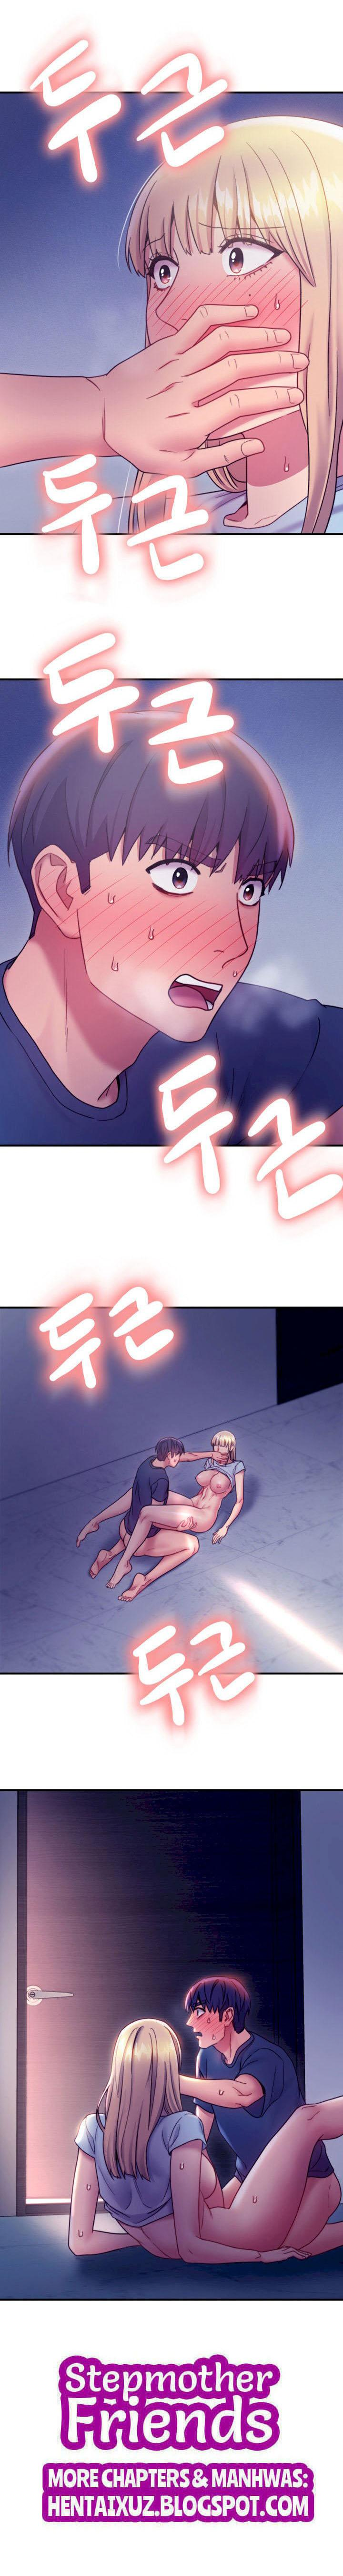 [Neck Pilllow] Stepmother Friends Ch.40/? [English] [Hentai Universe] NEW! 22/10/2020 252